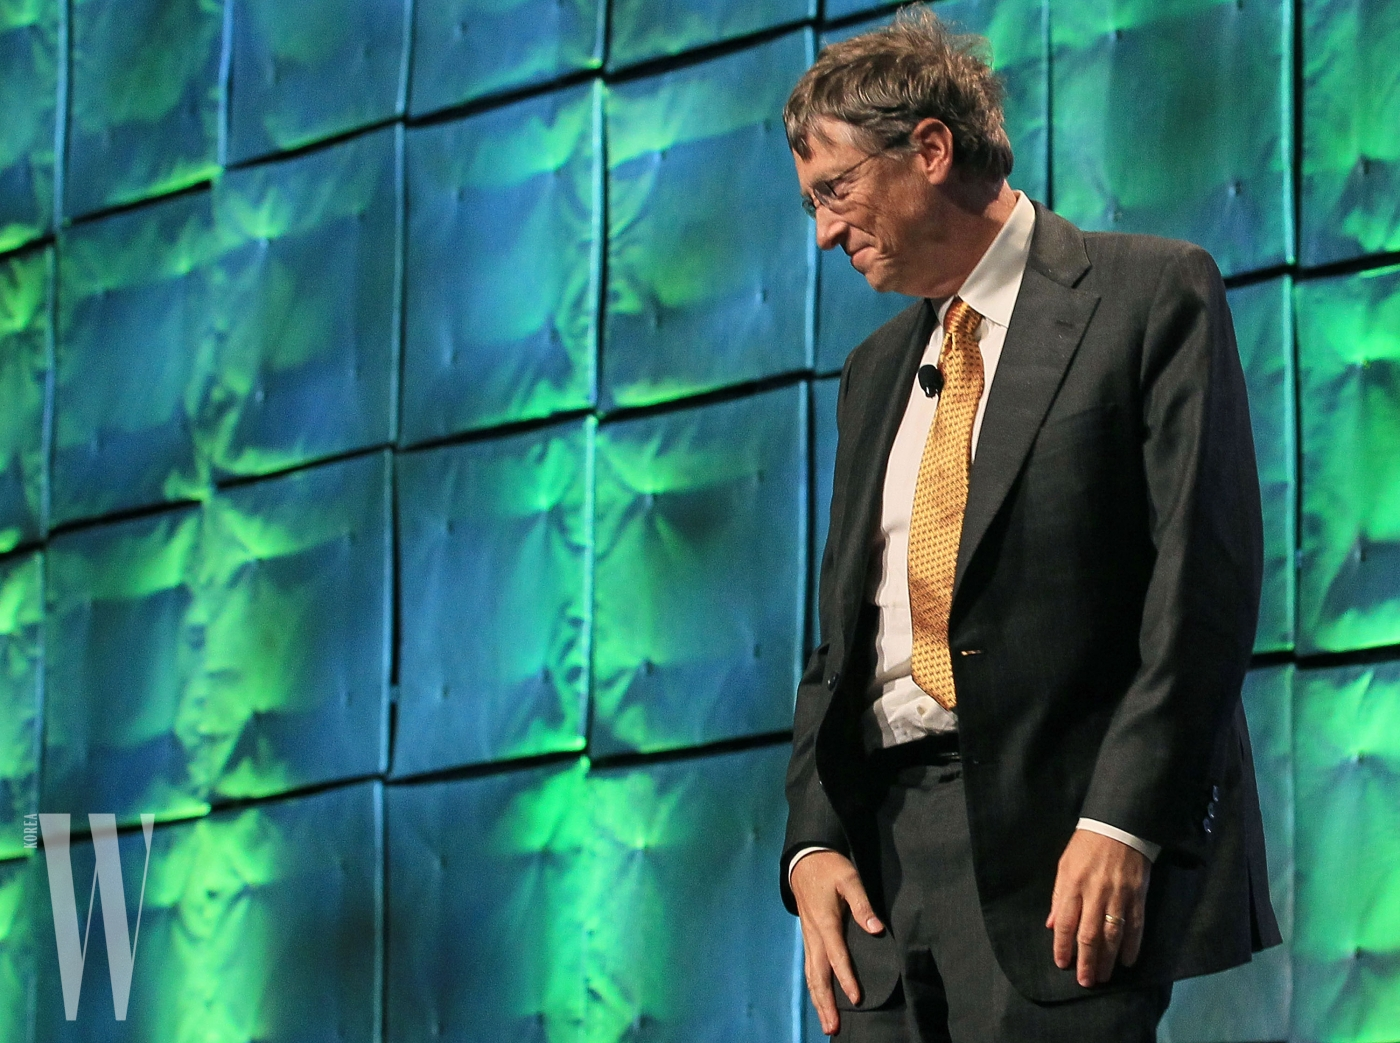 Bill Gates Takes Part In Health Summit In Washington